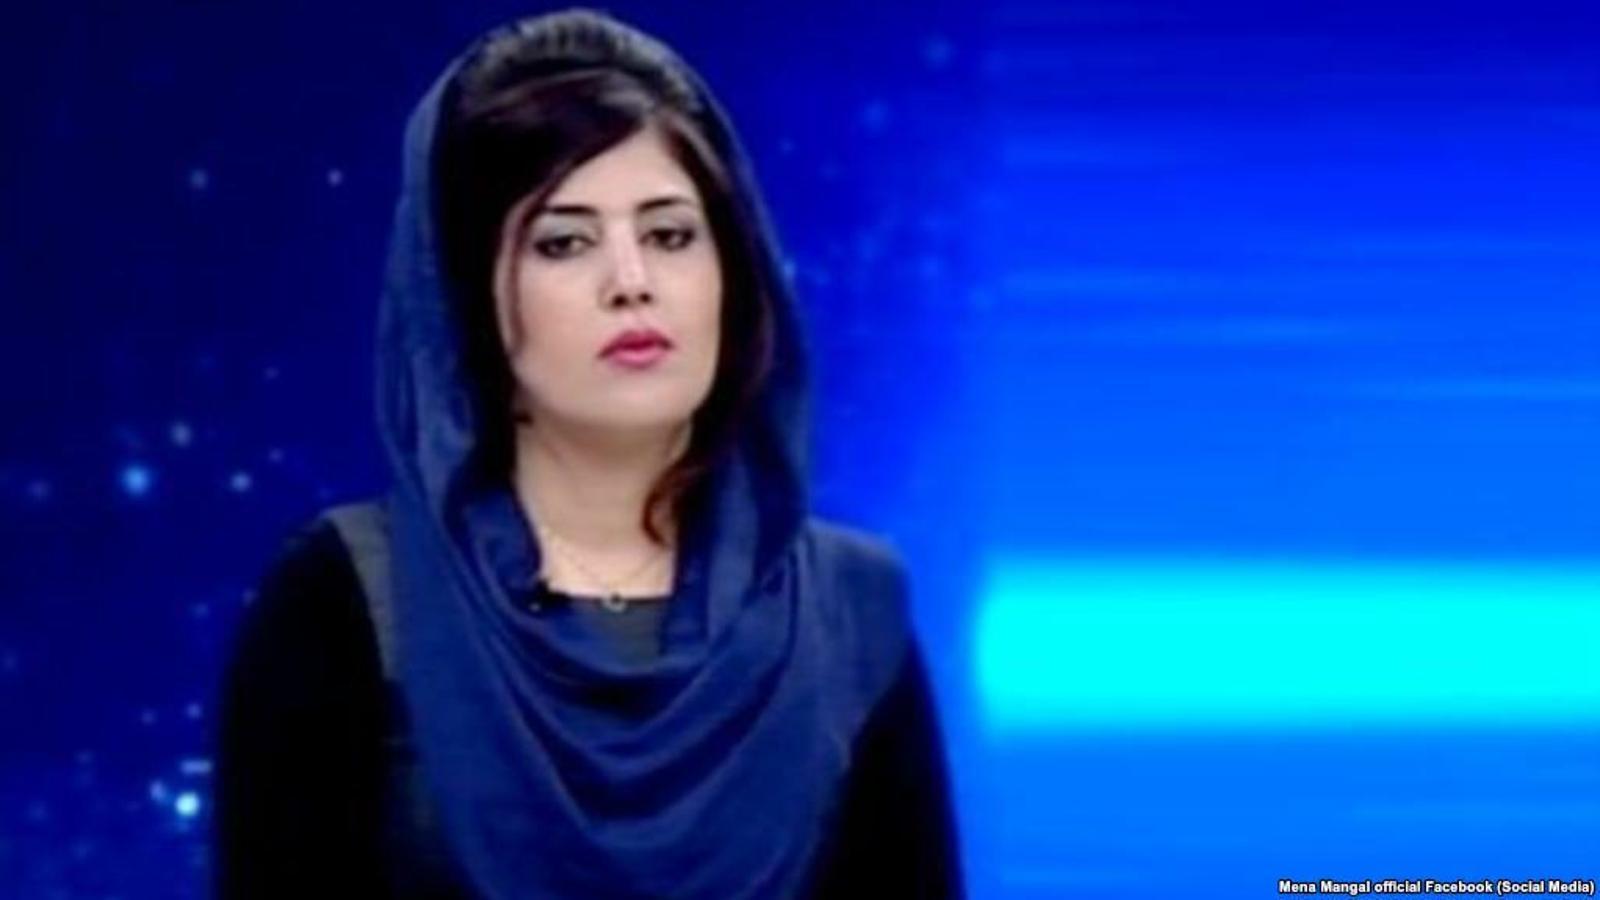 Maten a trets una periodista a Kabul